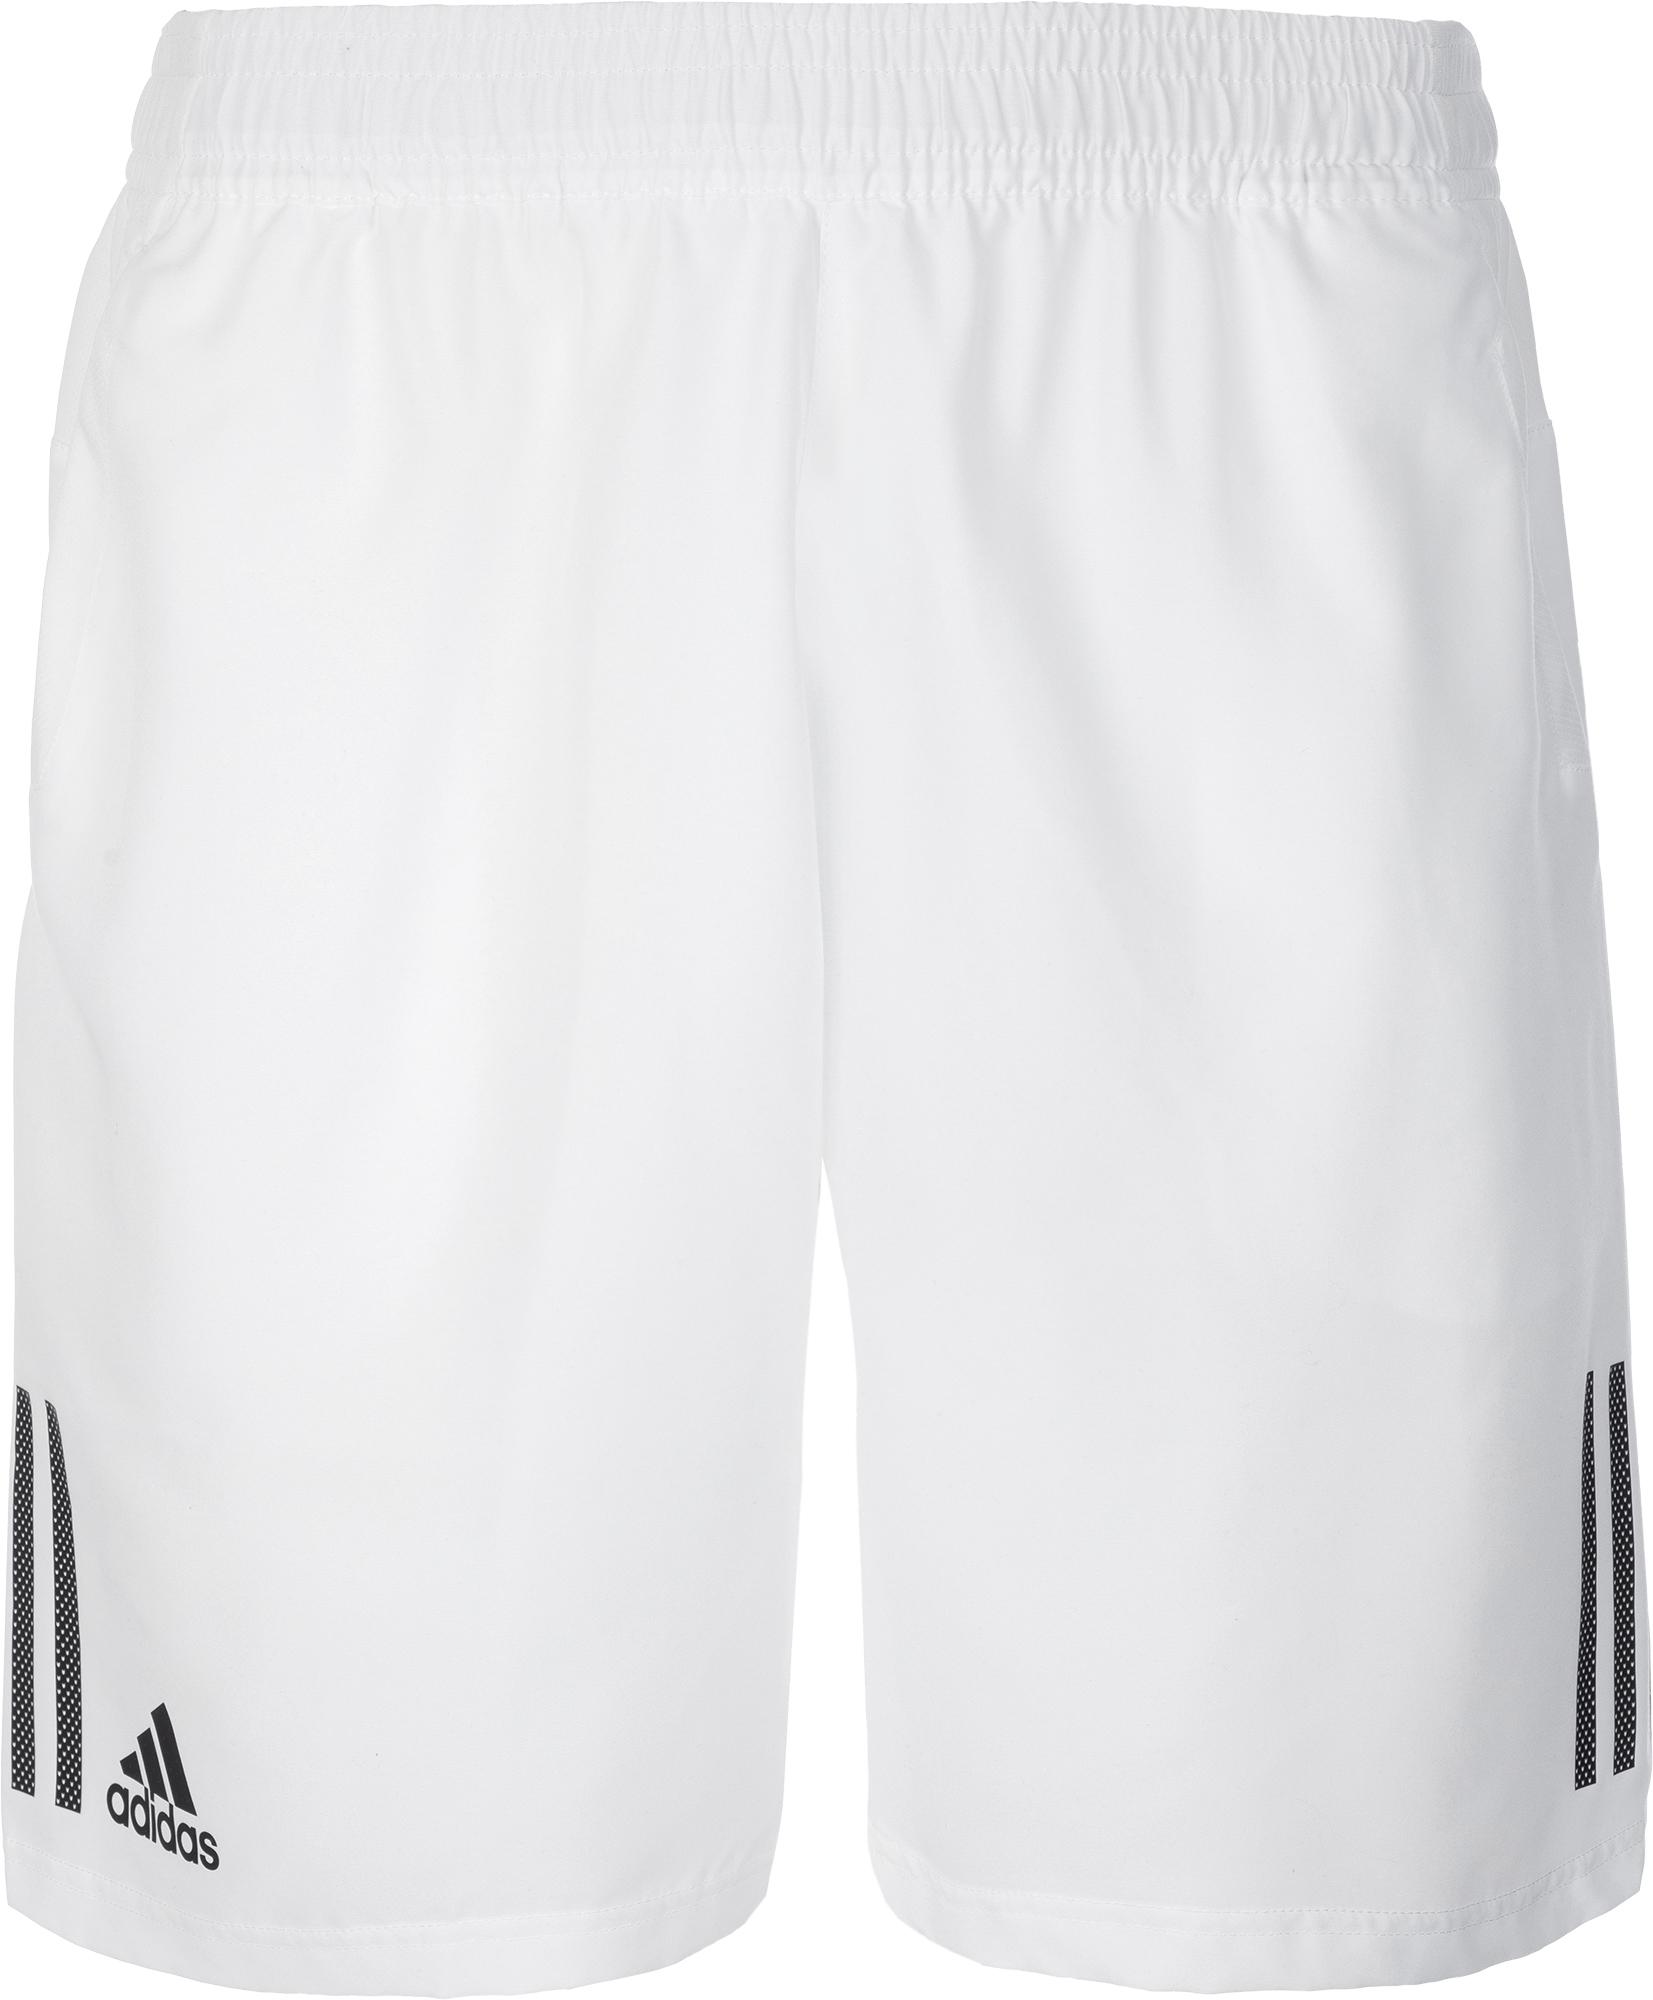 Adidas Шорты мужские Adidas 3-Stripes 9-Inch, размер 52-54 шорты для тенниса мужские adidas uncontrol climachill цвет черный b45842 размер l 52 54